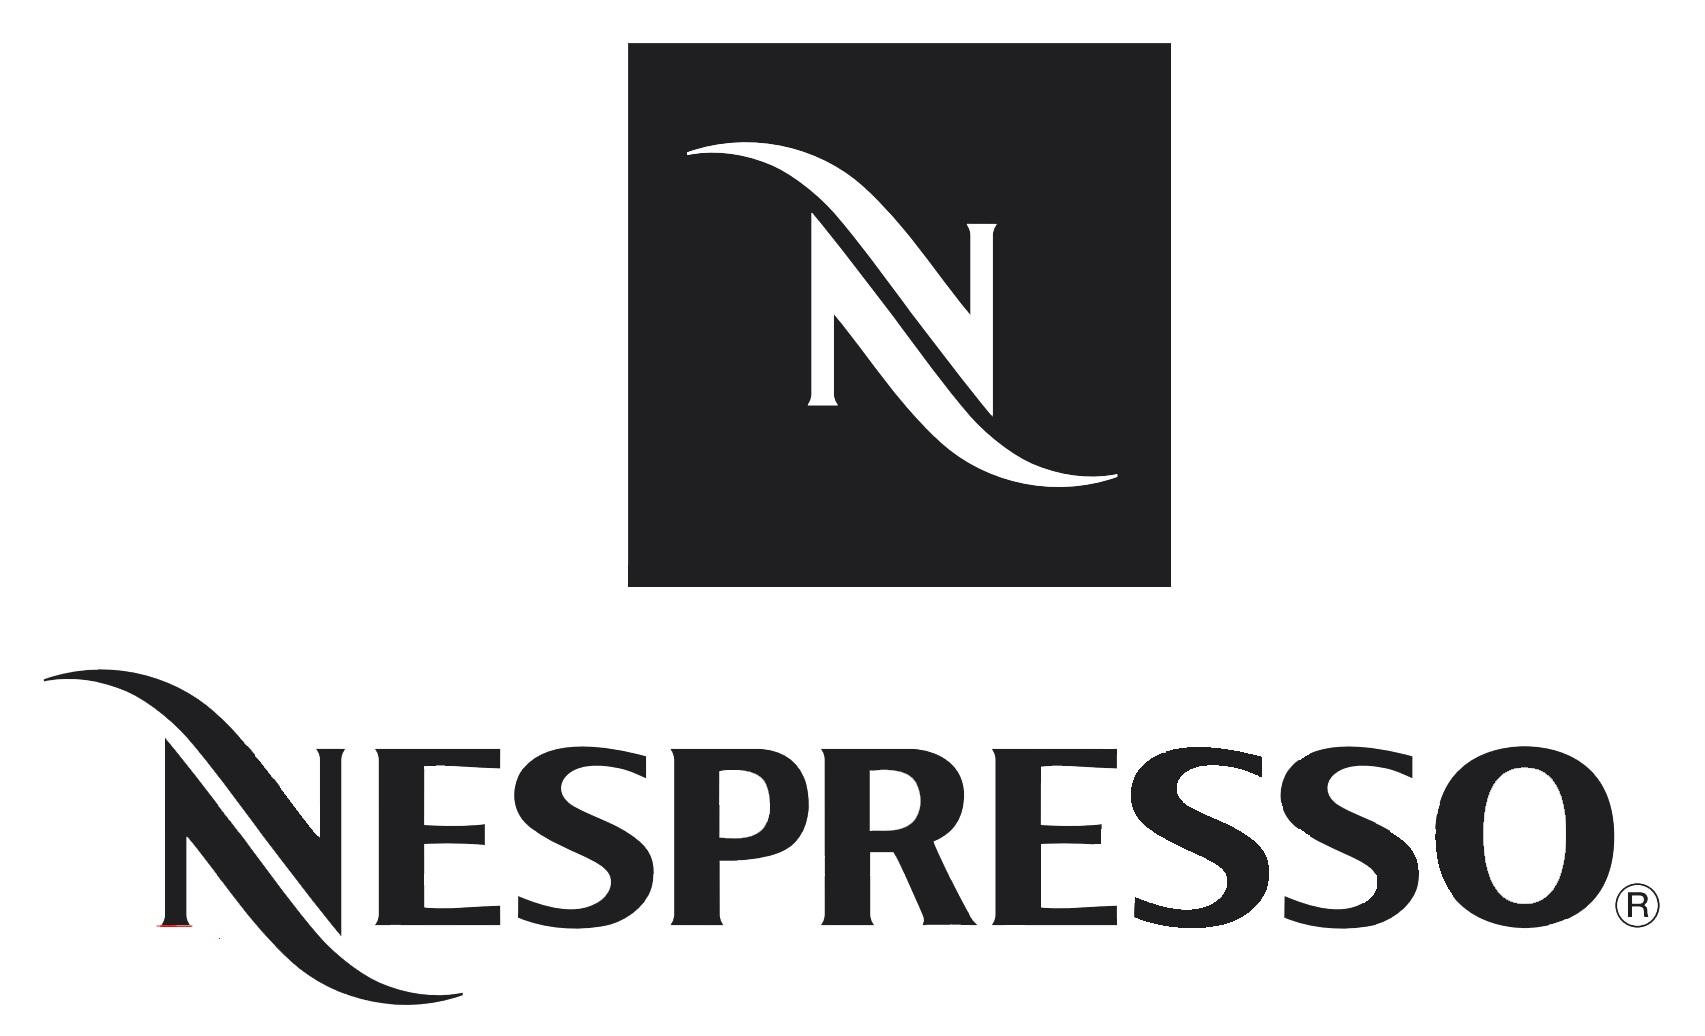 nespresso+logo.jpg